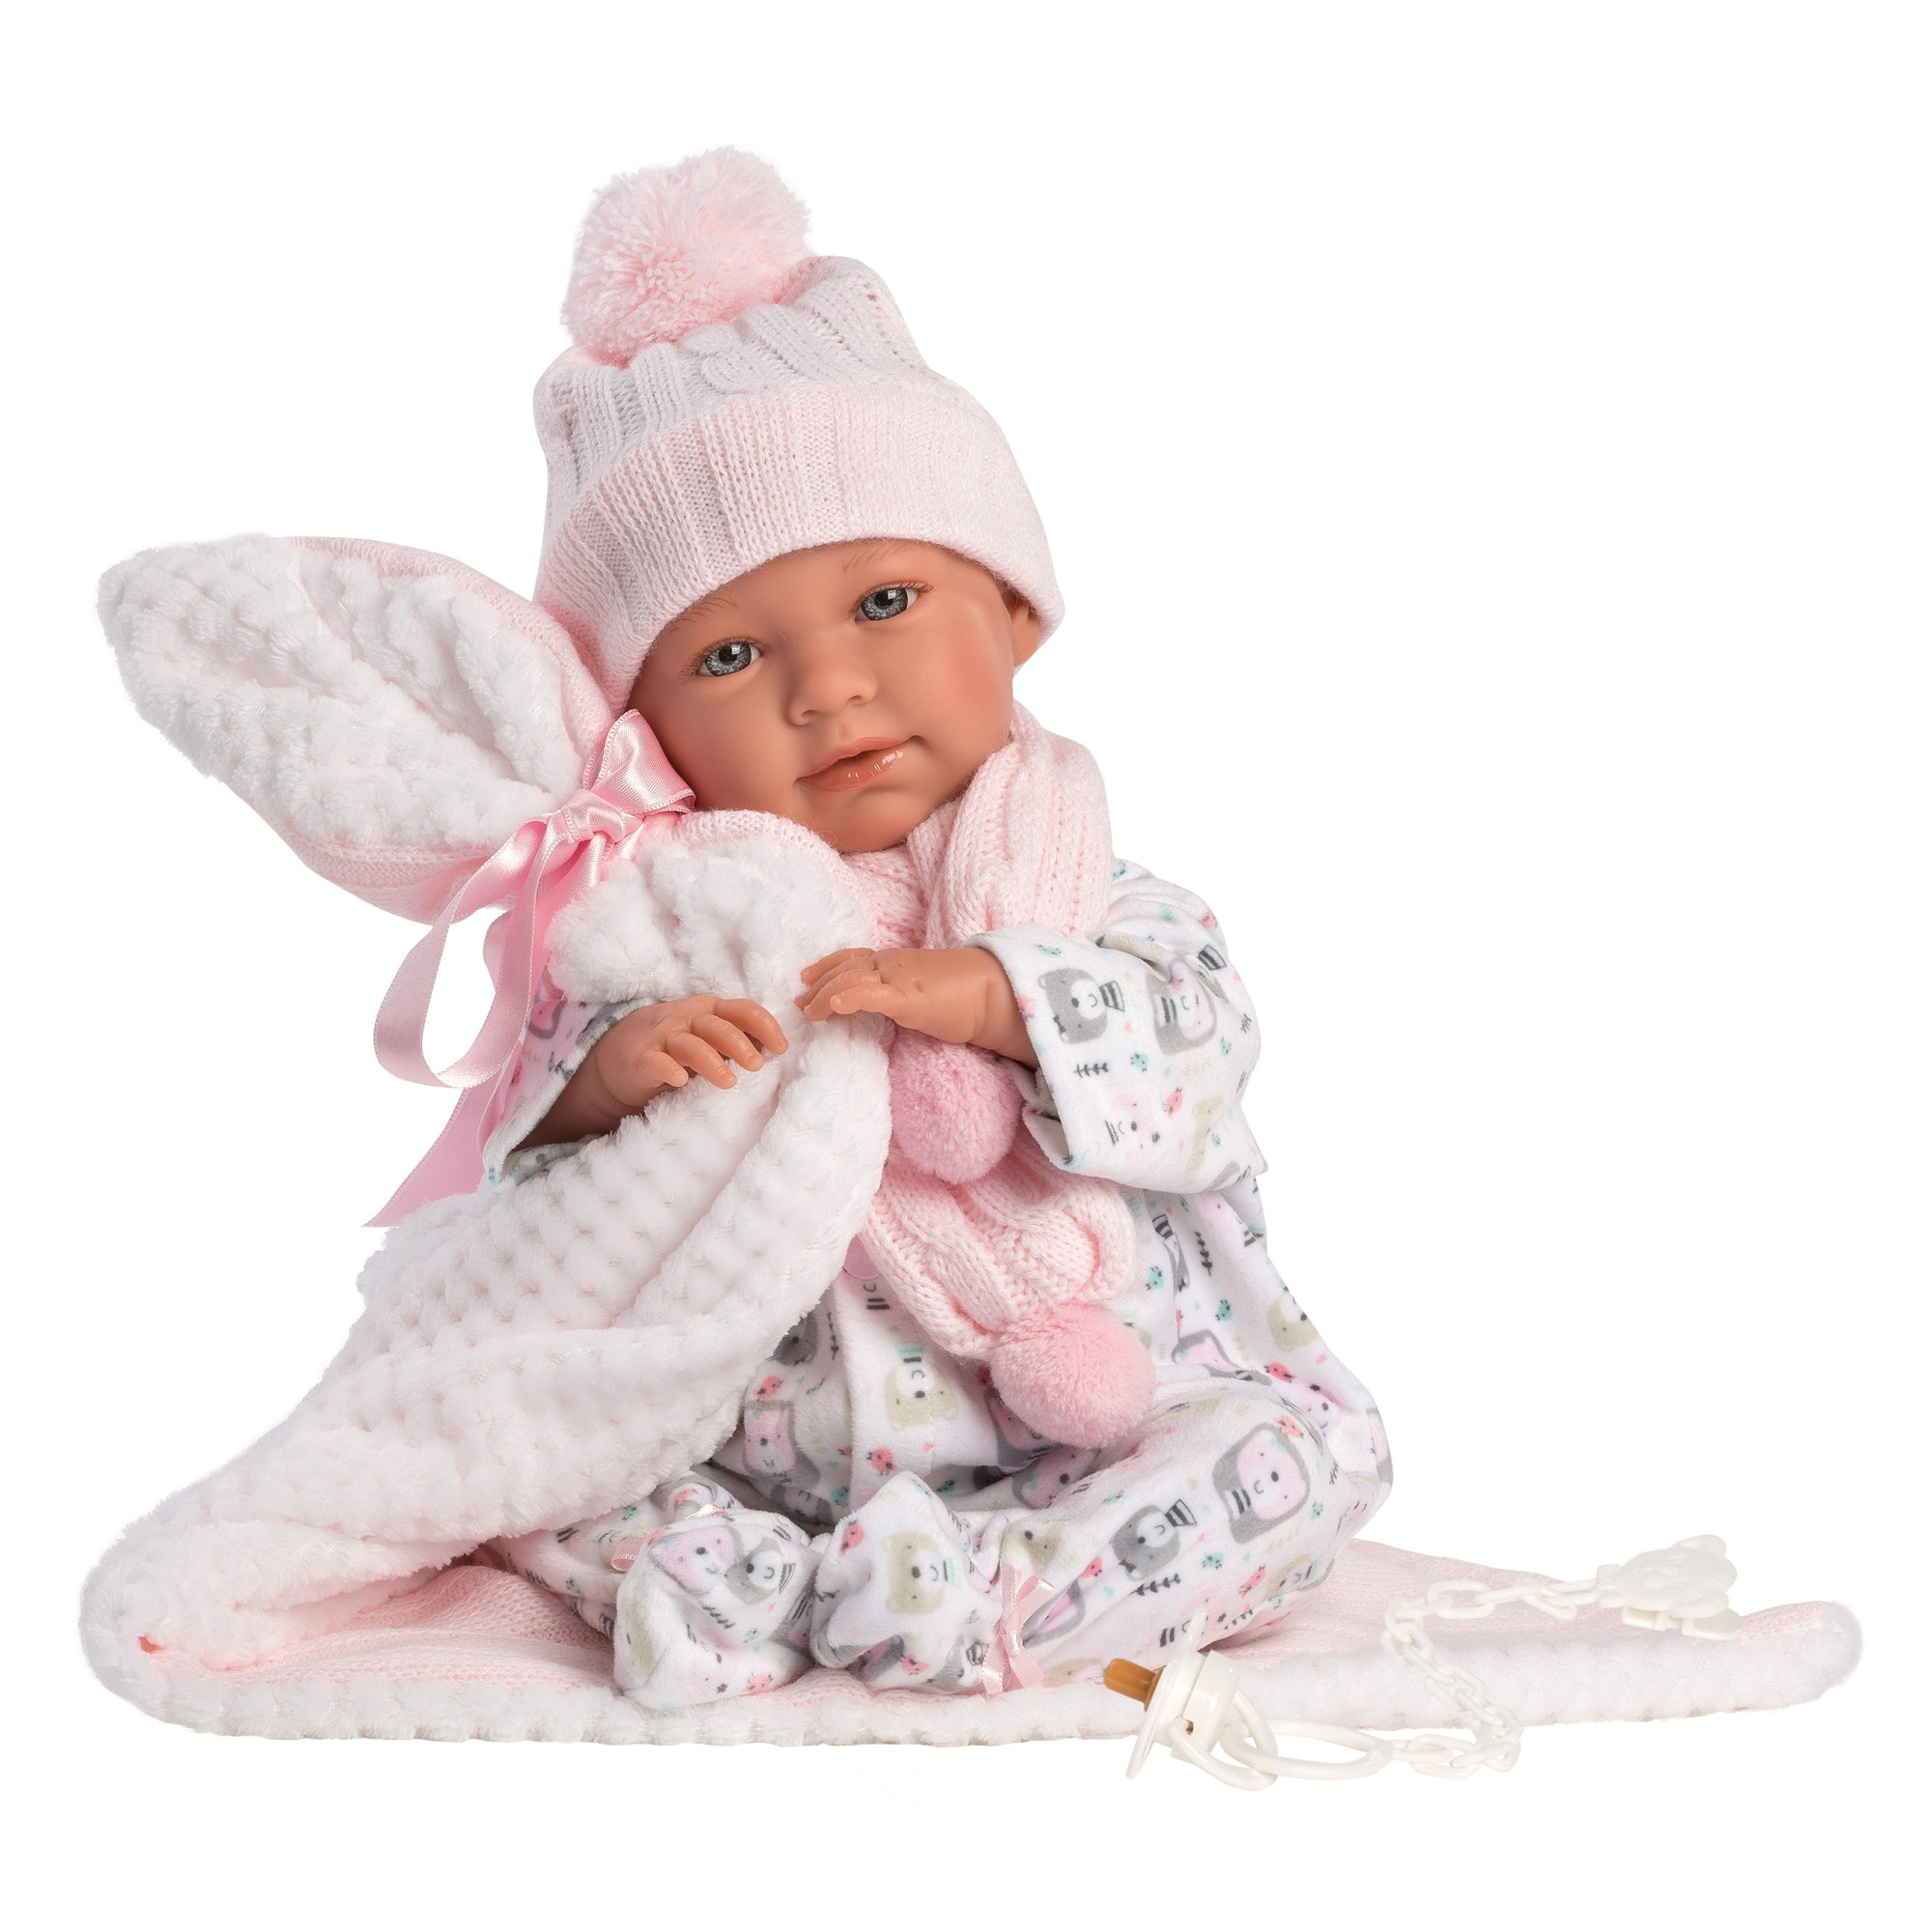 Fotografie Papusa interactiva Llorens Newborns That Cry - Baby Mimi, cu paturica alba, 42 cm